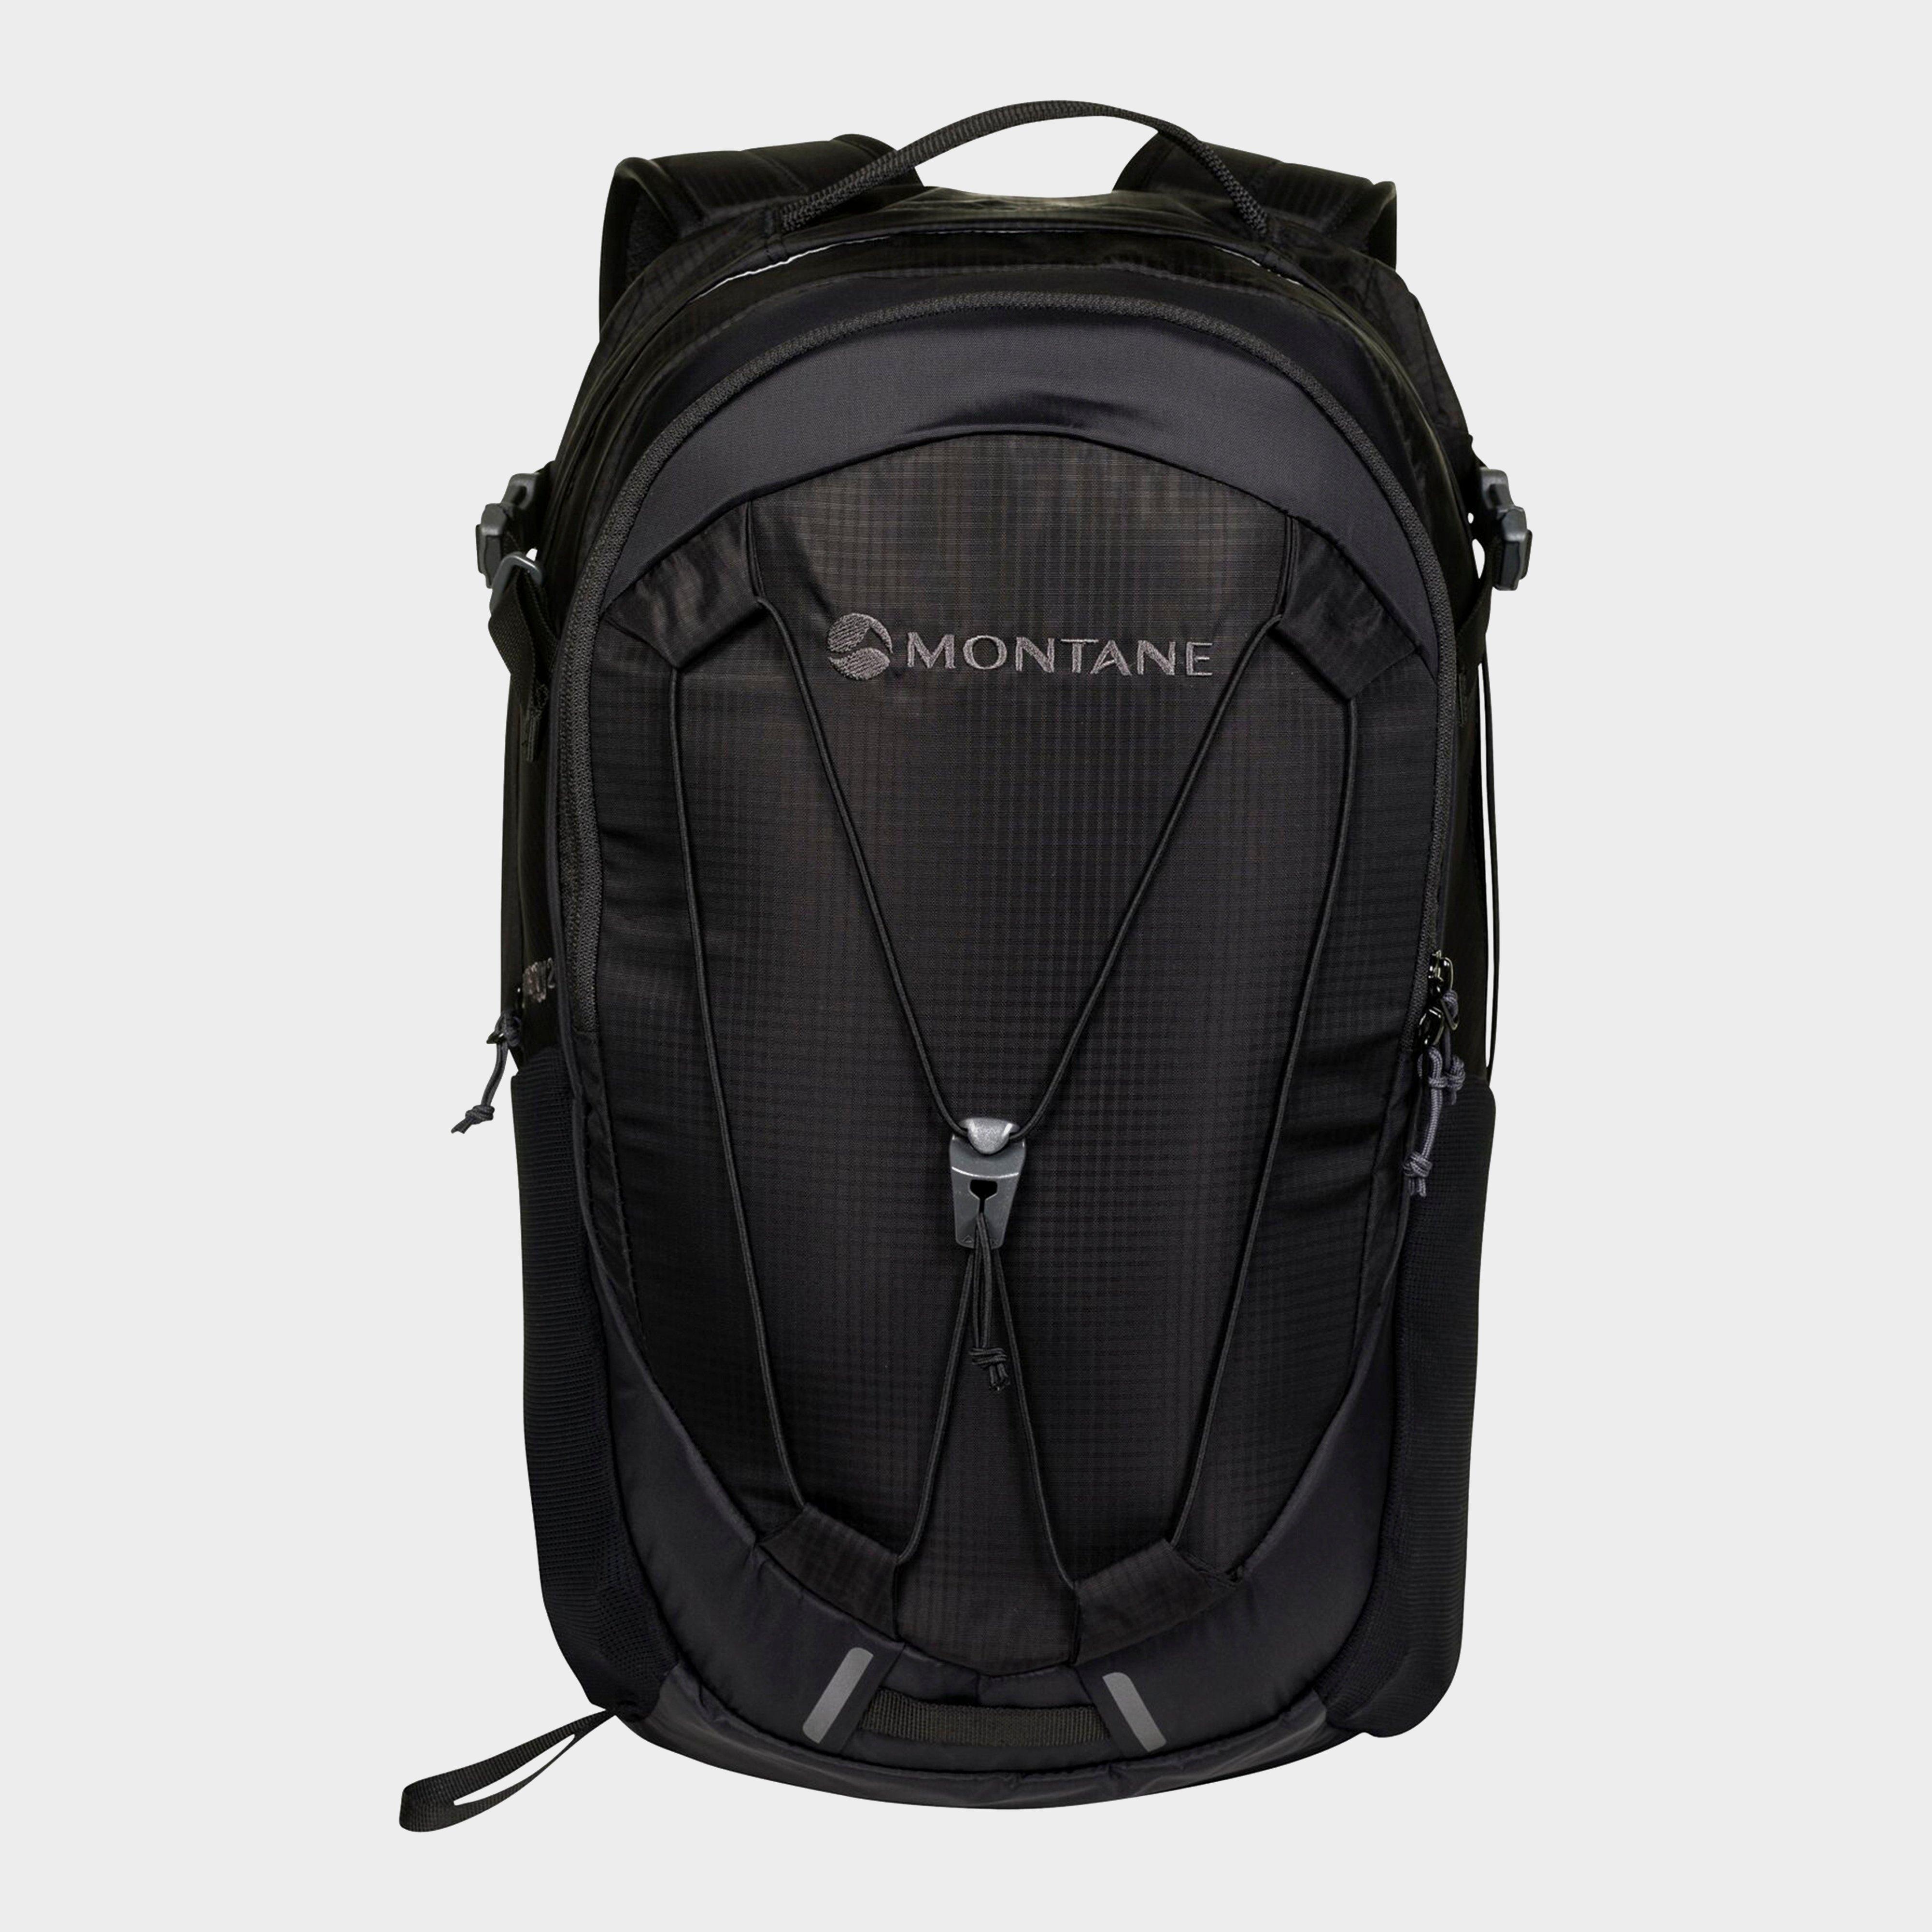 Montane Montane Synergy 20L Backpack - Black, Black